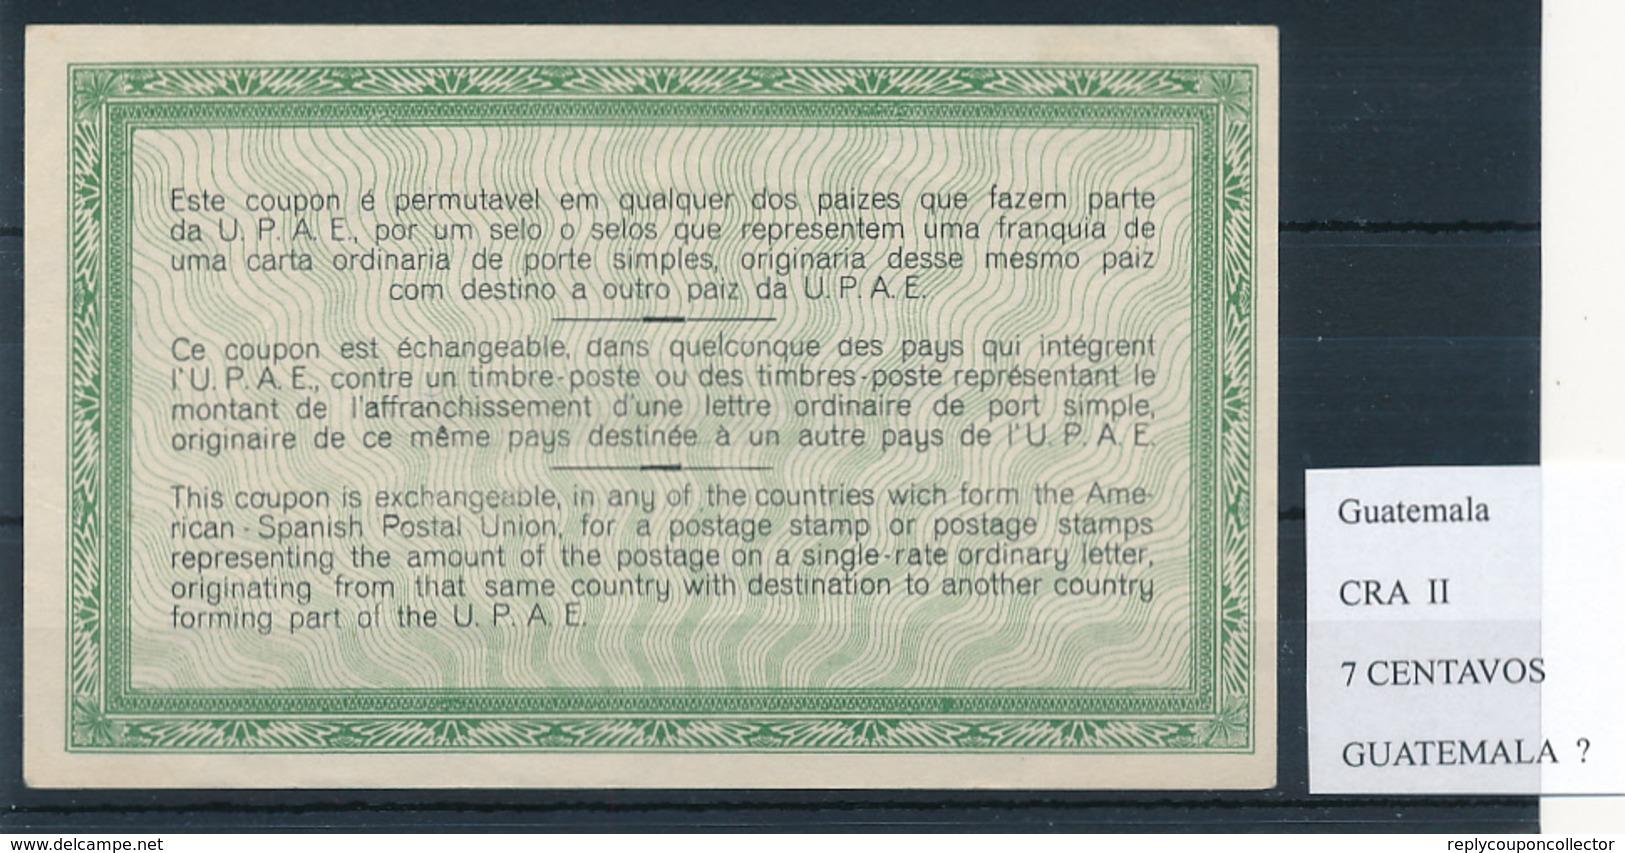 GUATEMALA - Type II  , 7 CENTAVOS  - COUPON-RESPUESTA AMERICOESPANOL , Reply Coupon Reponse , UPAE , PUAS - Guatemala